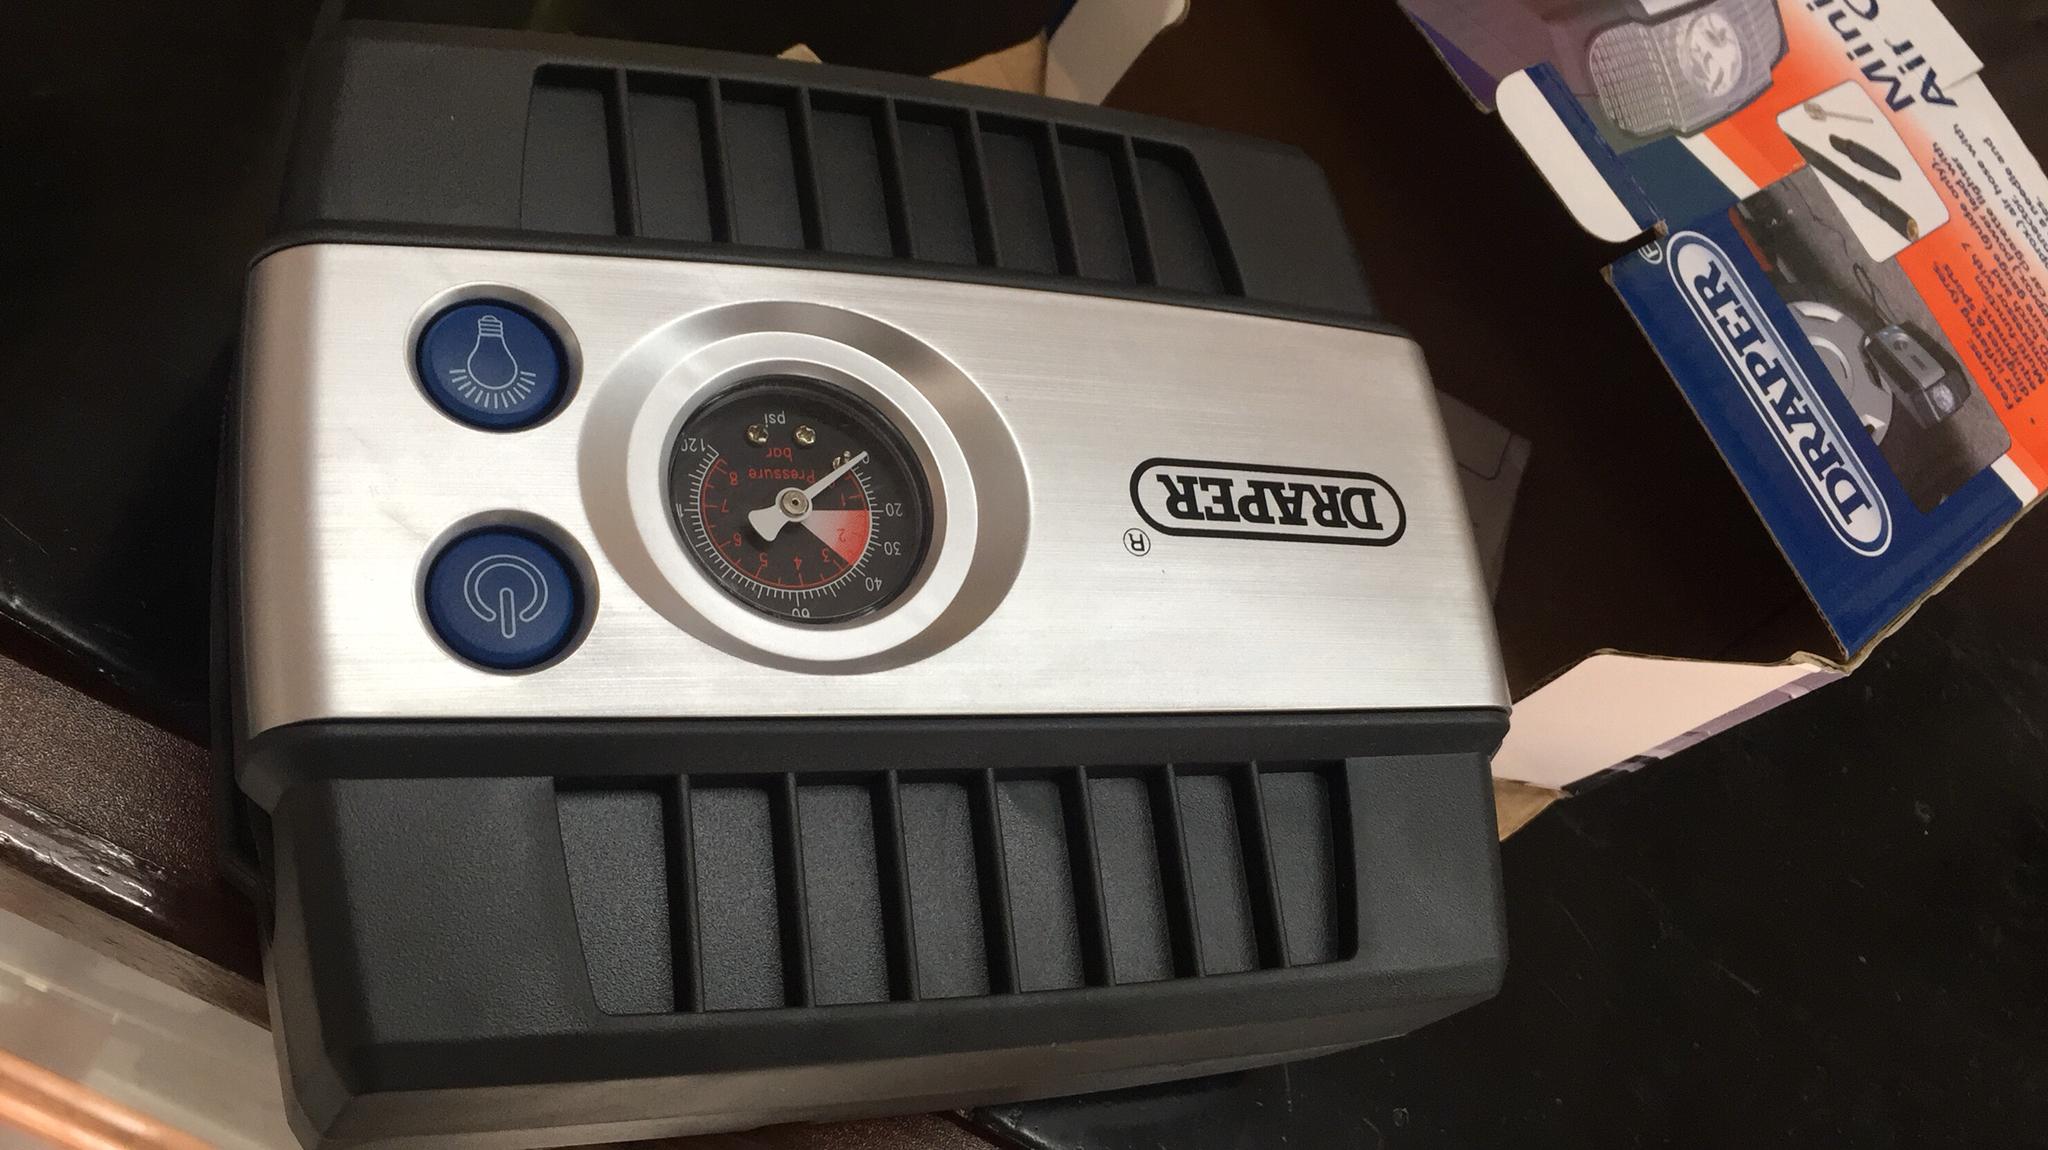 Mini analogue air compressor